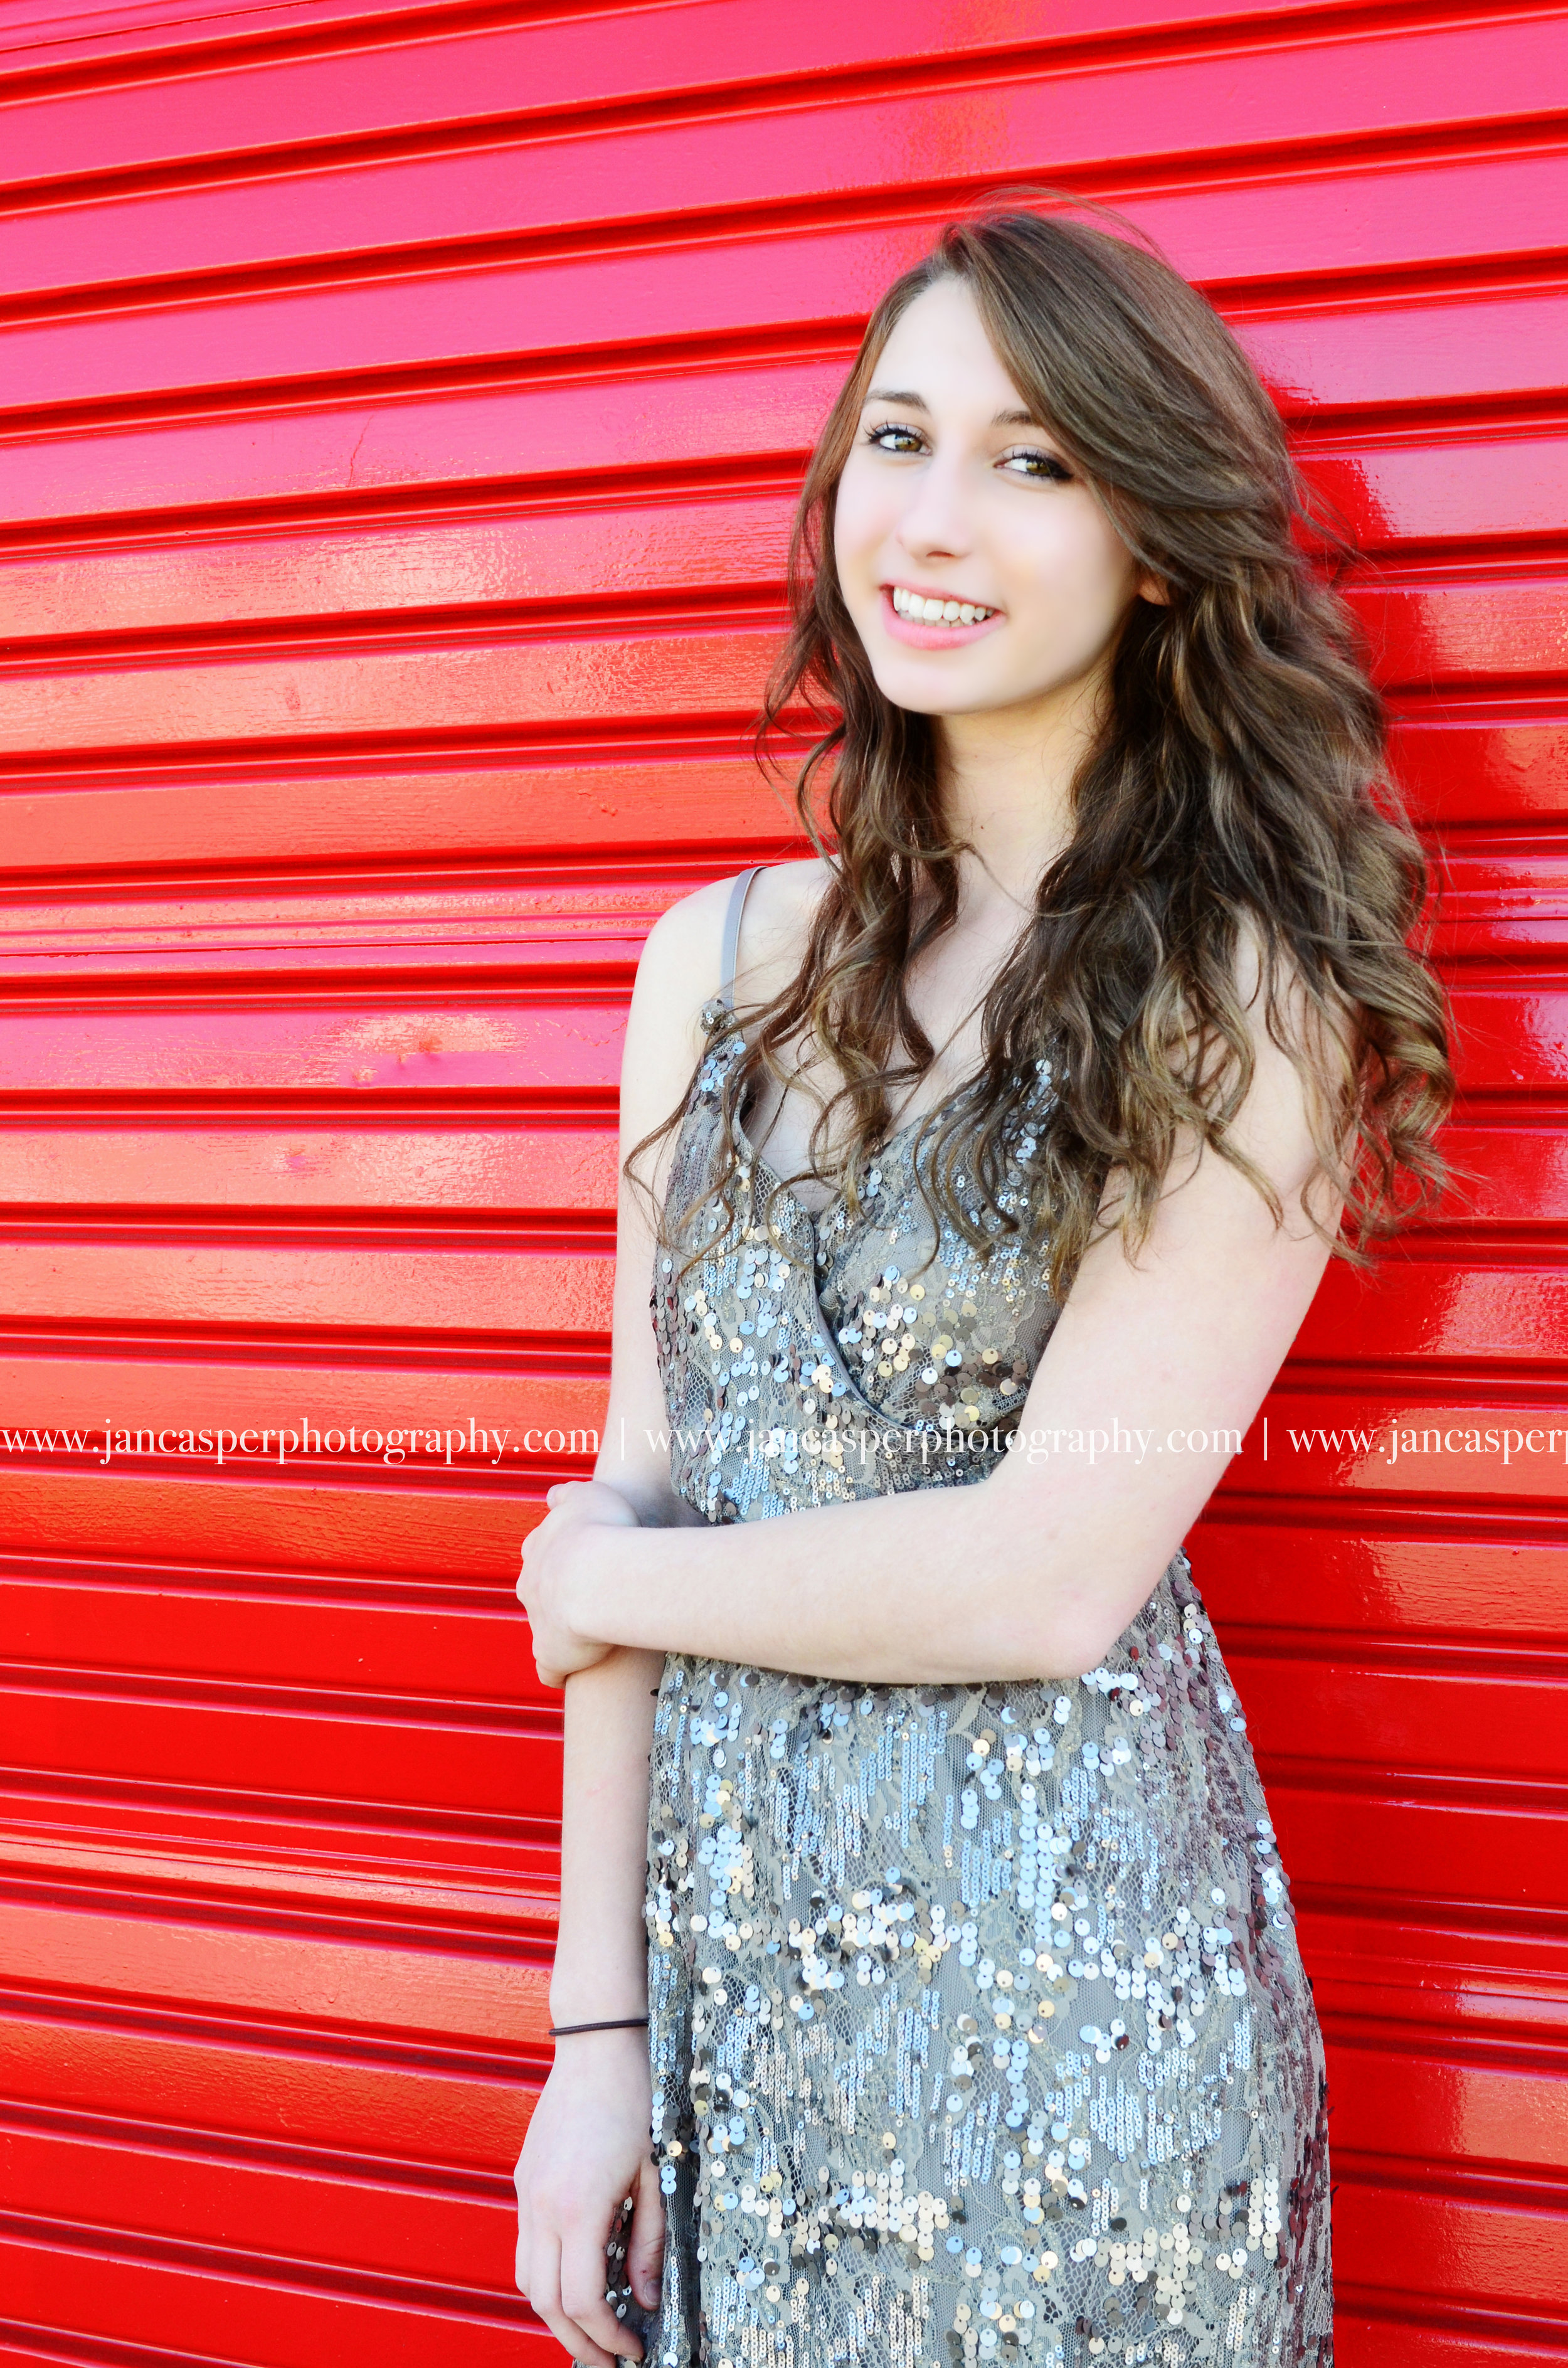 senior portrait Virginia Beach Jan Casper Photography prom dress Virginia